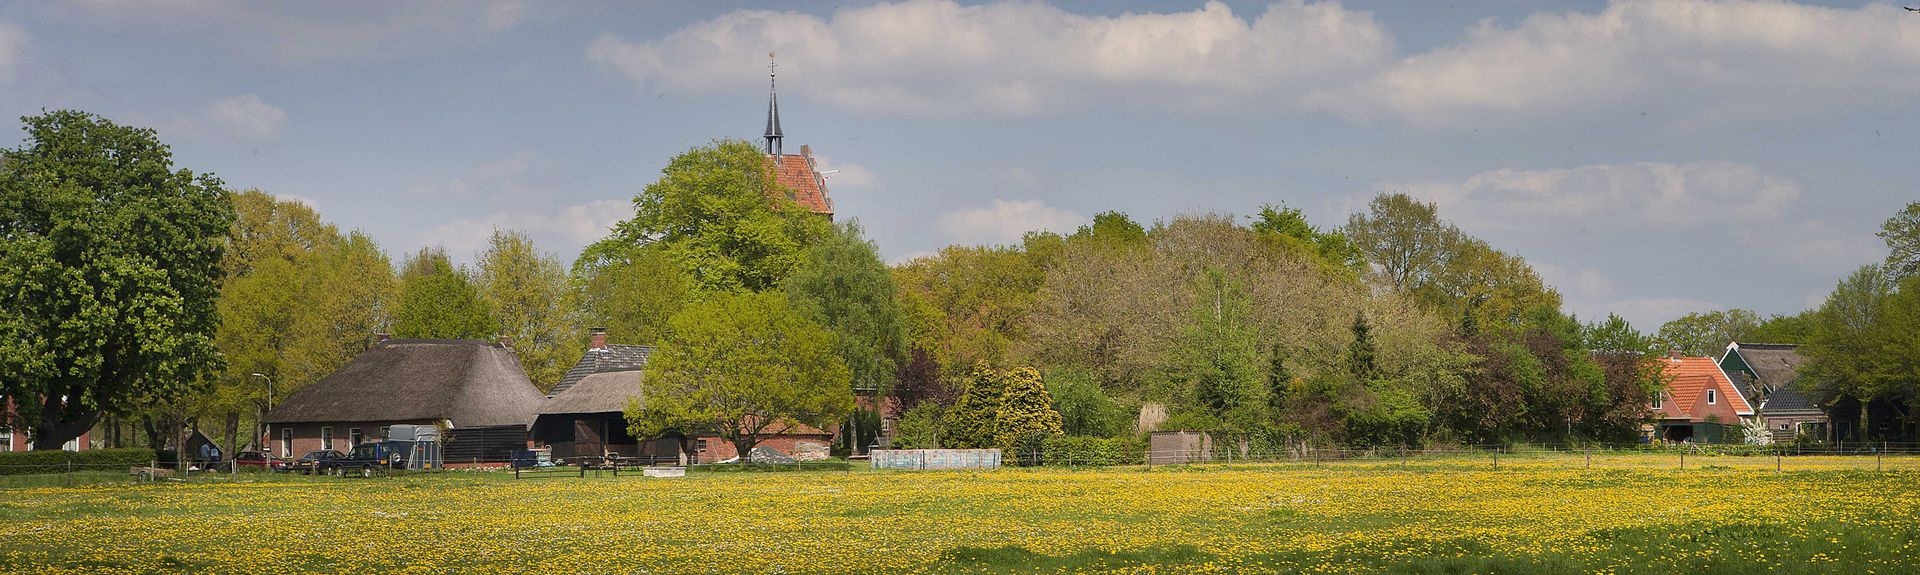 Norg, Netherlands